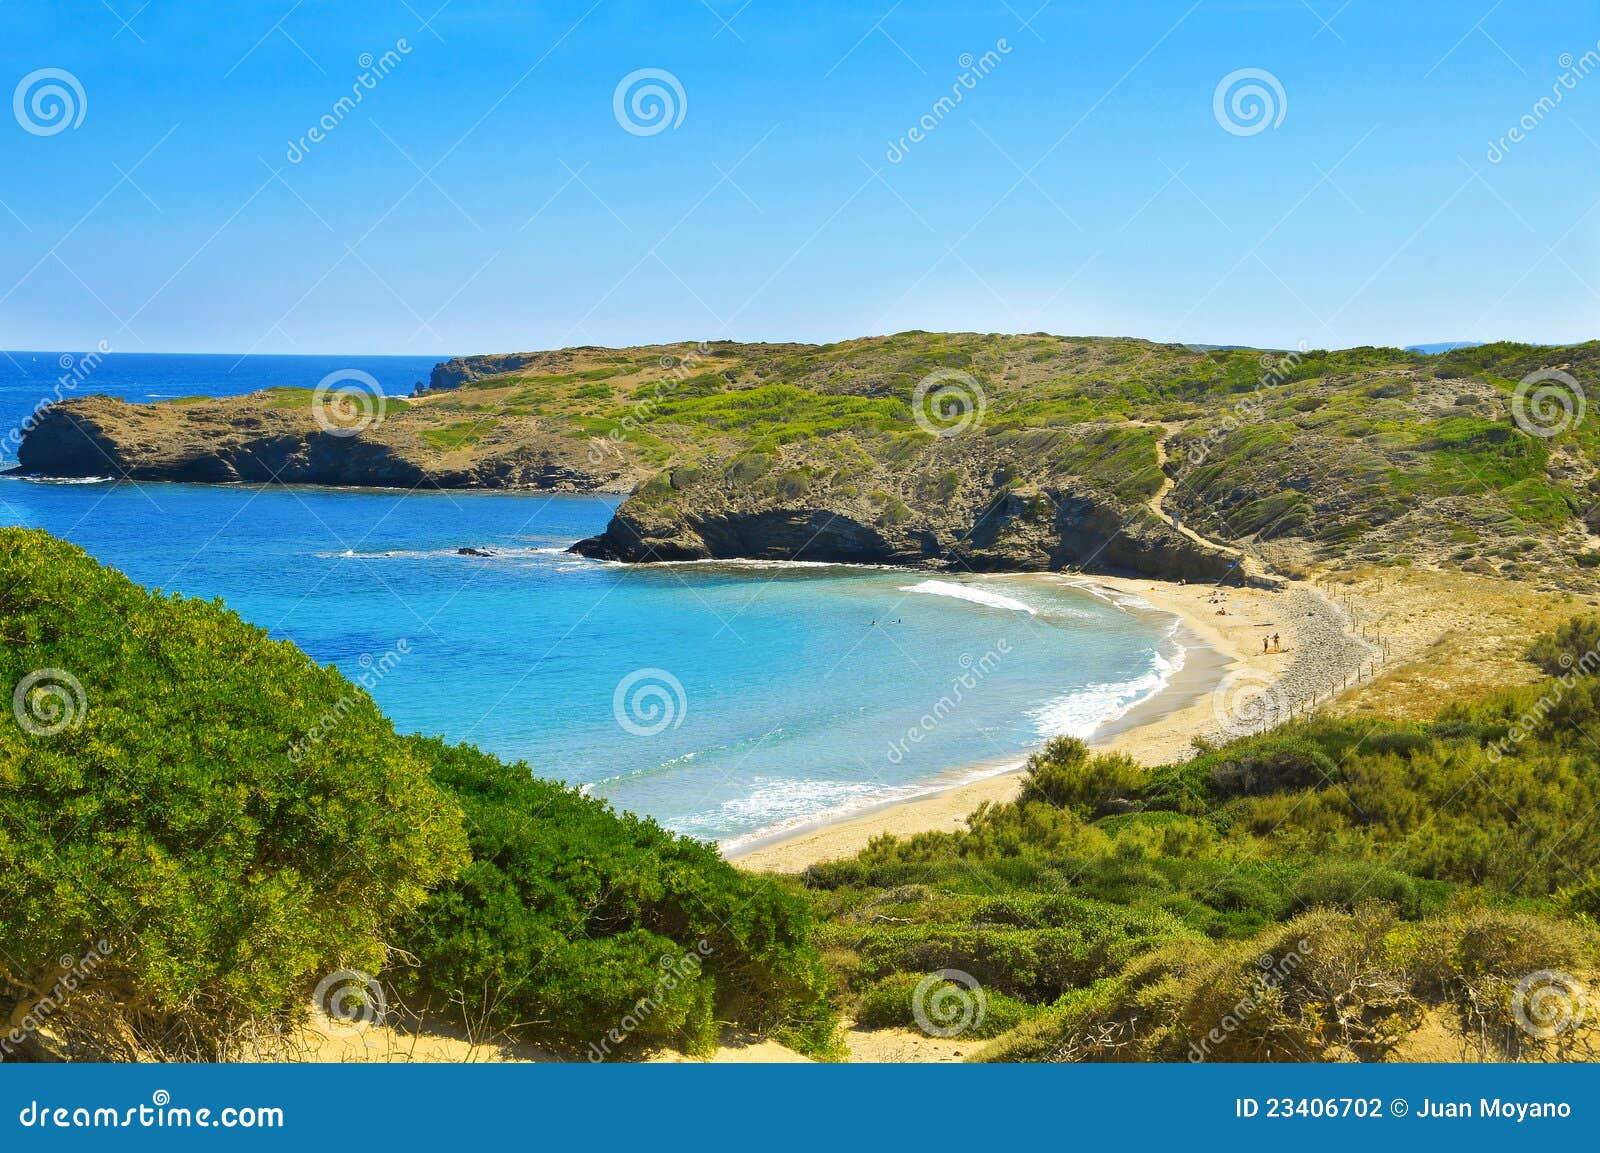 Tortuga beach in Menorca